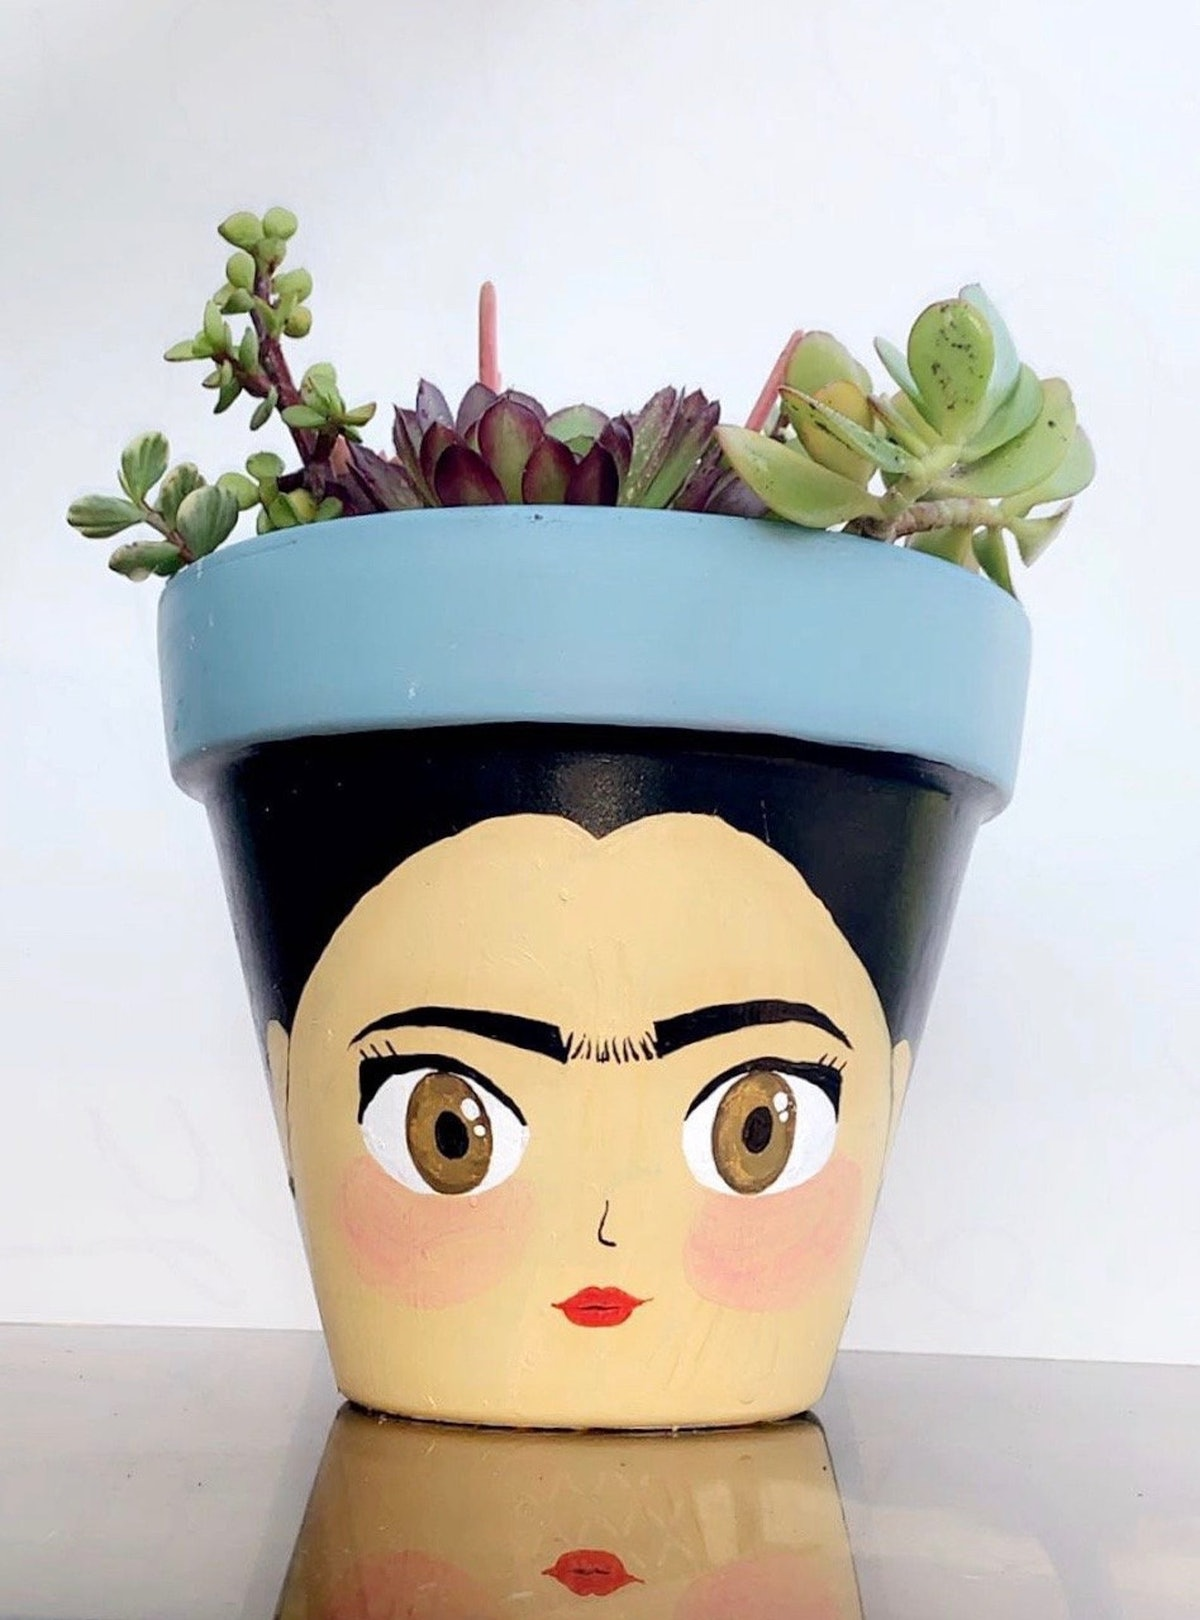 8-Inch Frida Kahlo Hand-Painted Pot